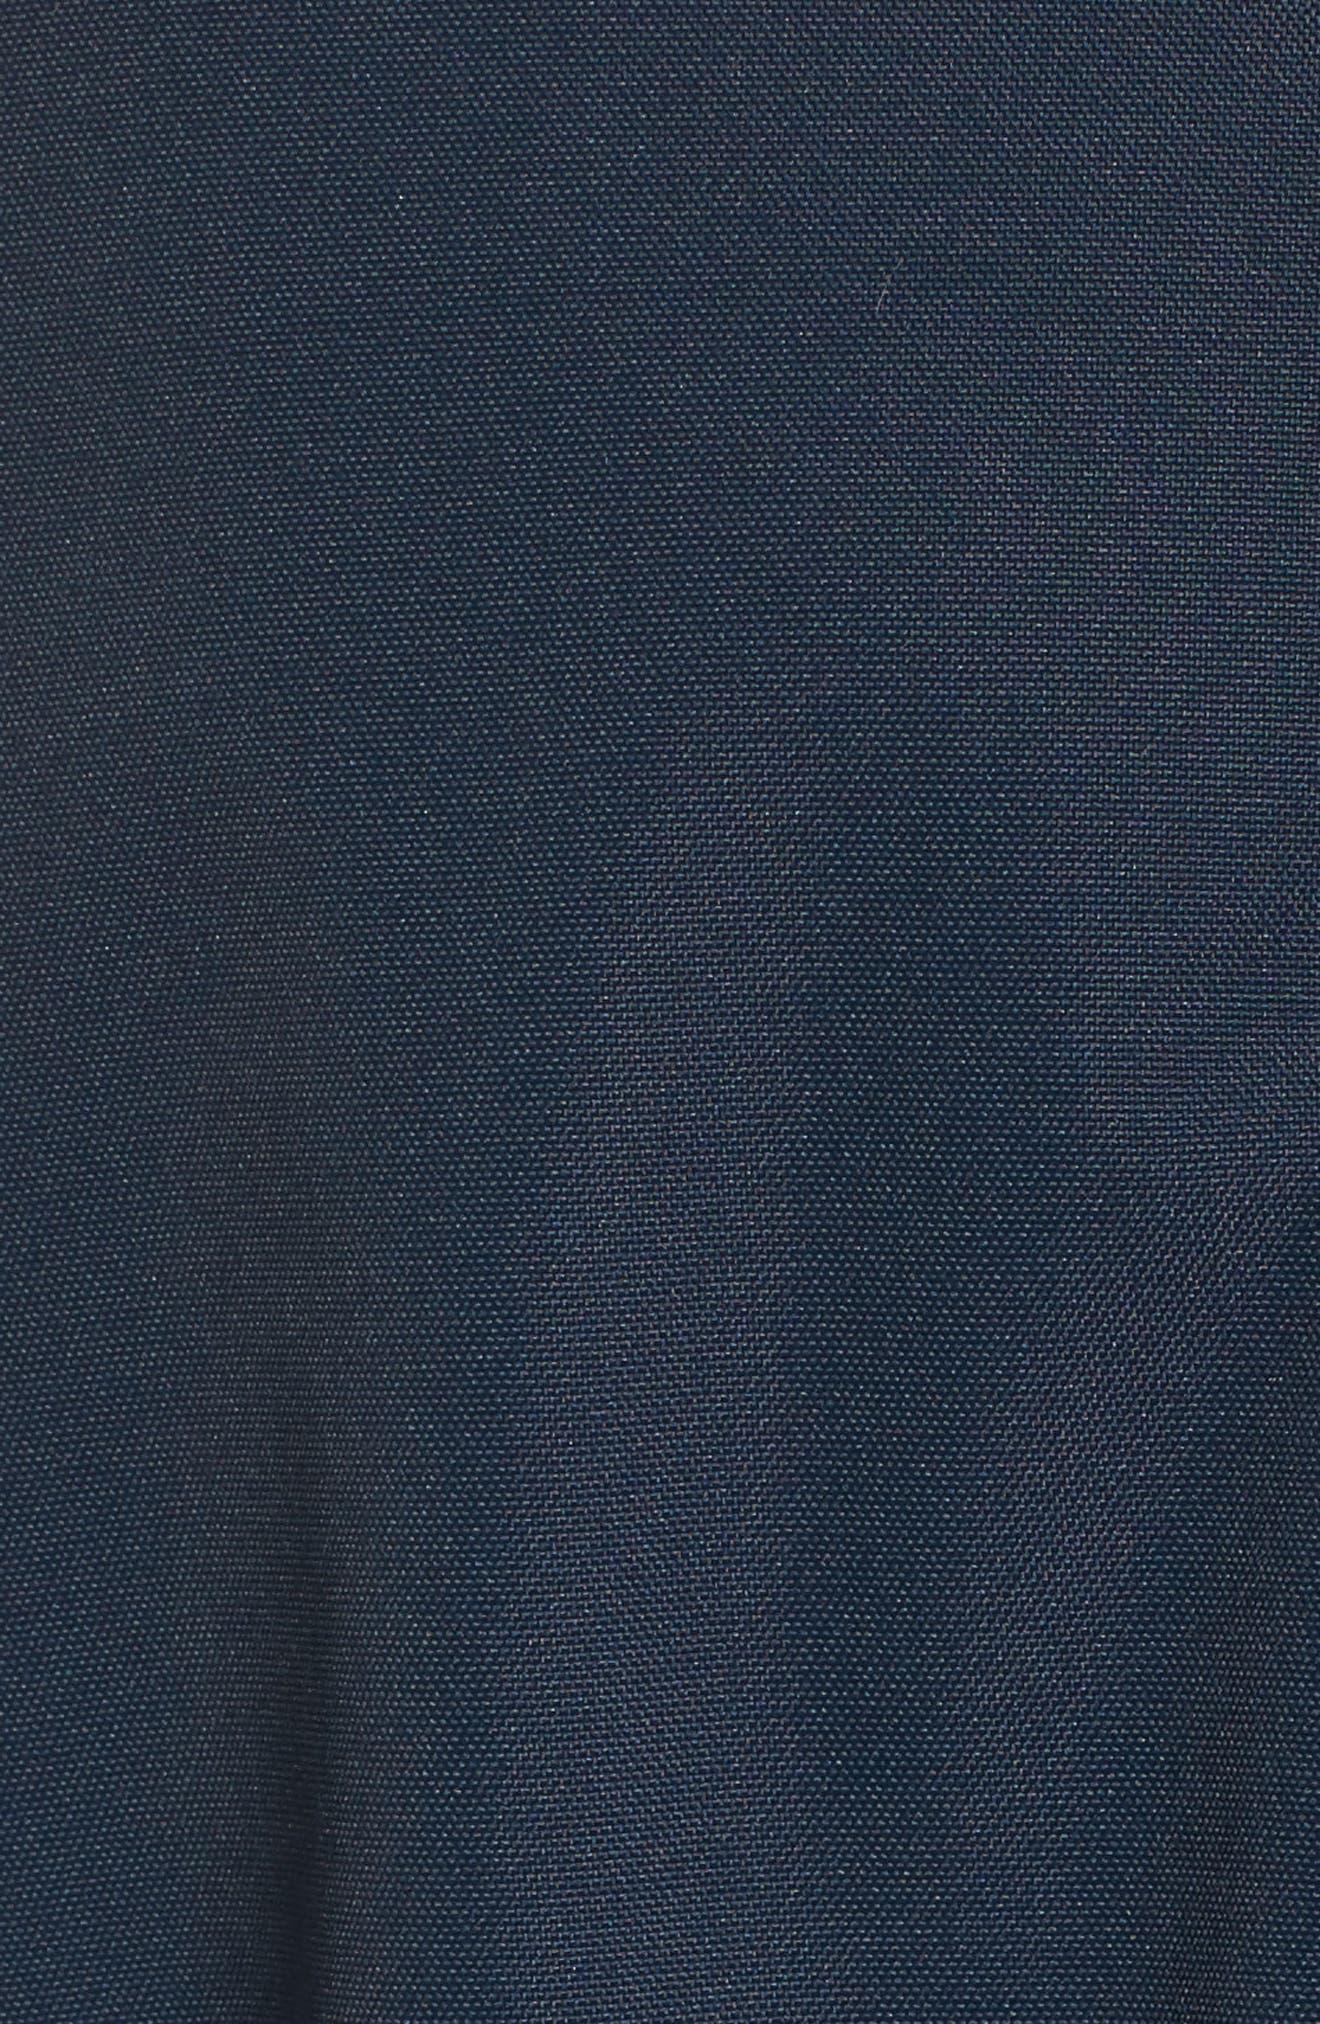 Whitford Anorak Jacket,                             Alternate thumbnail 5, color,                             Navy